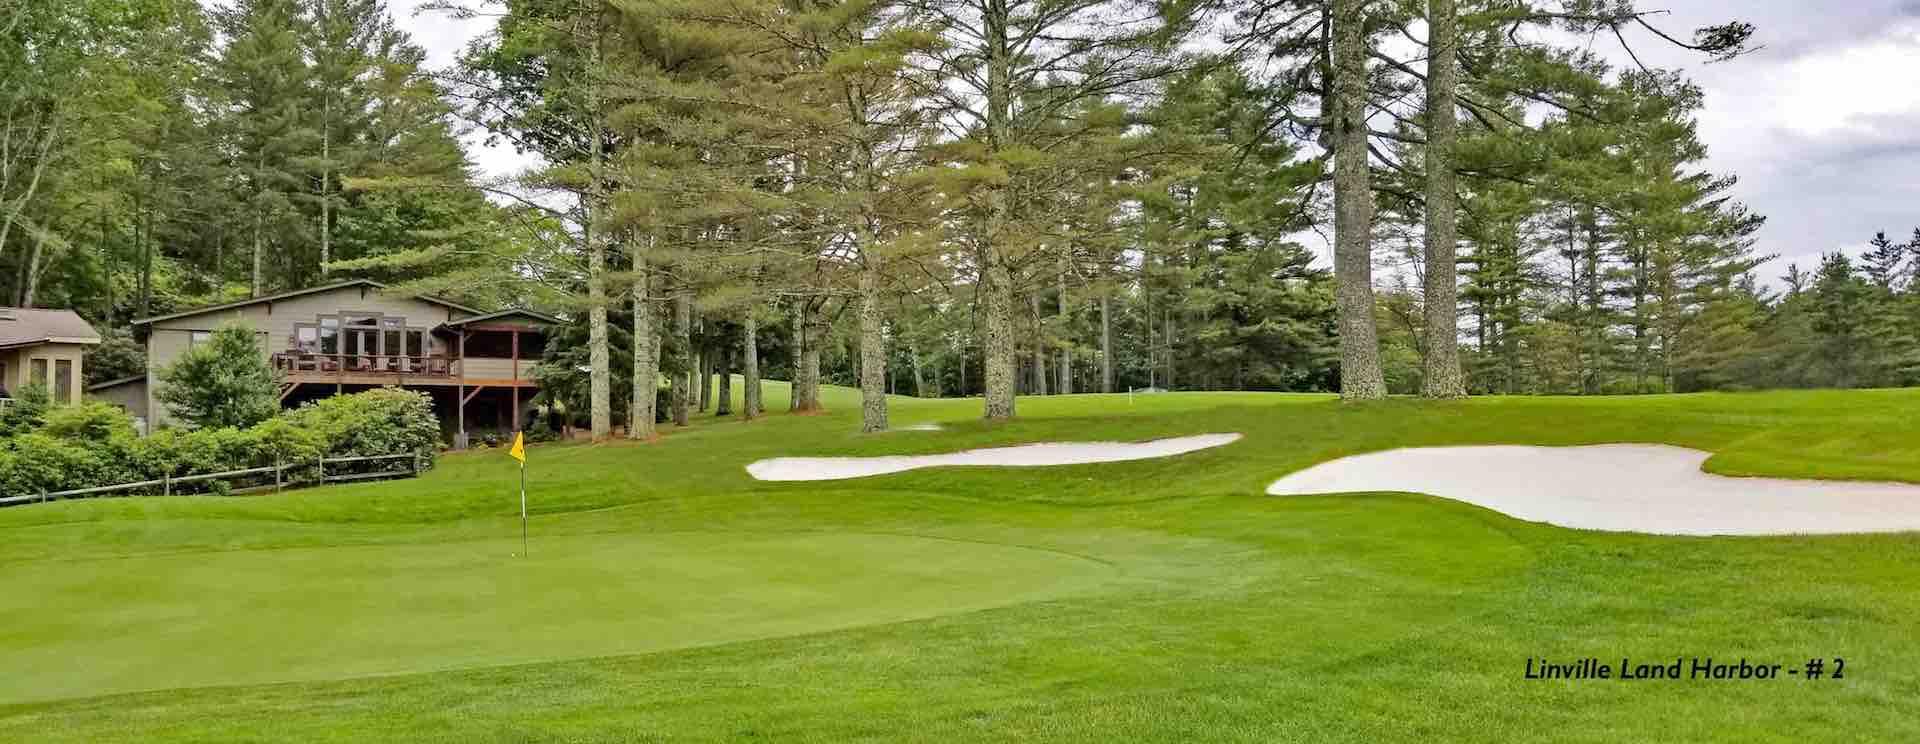 Linville Land Harbor Golf Club